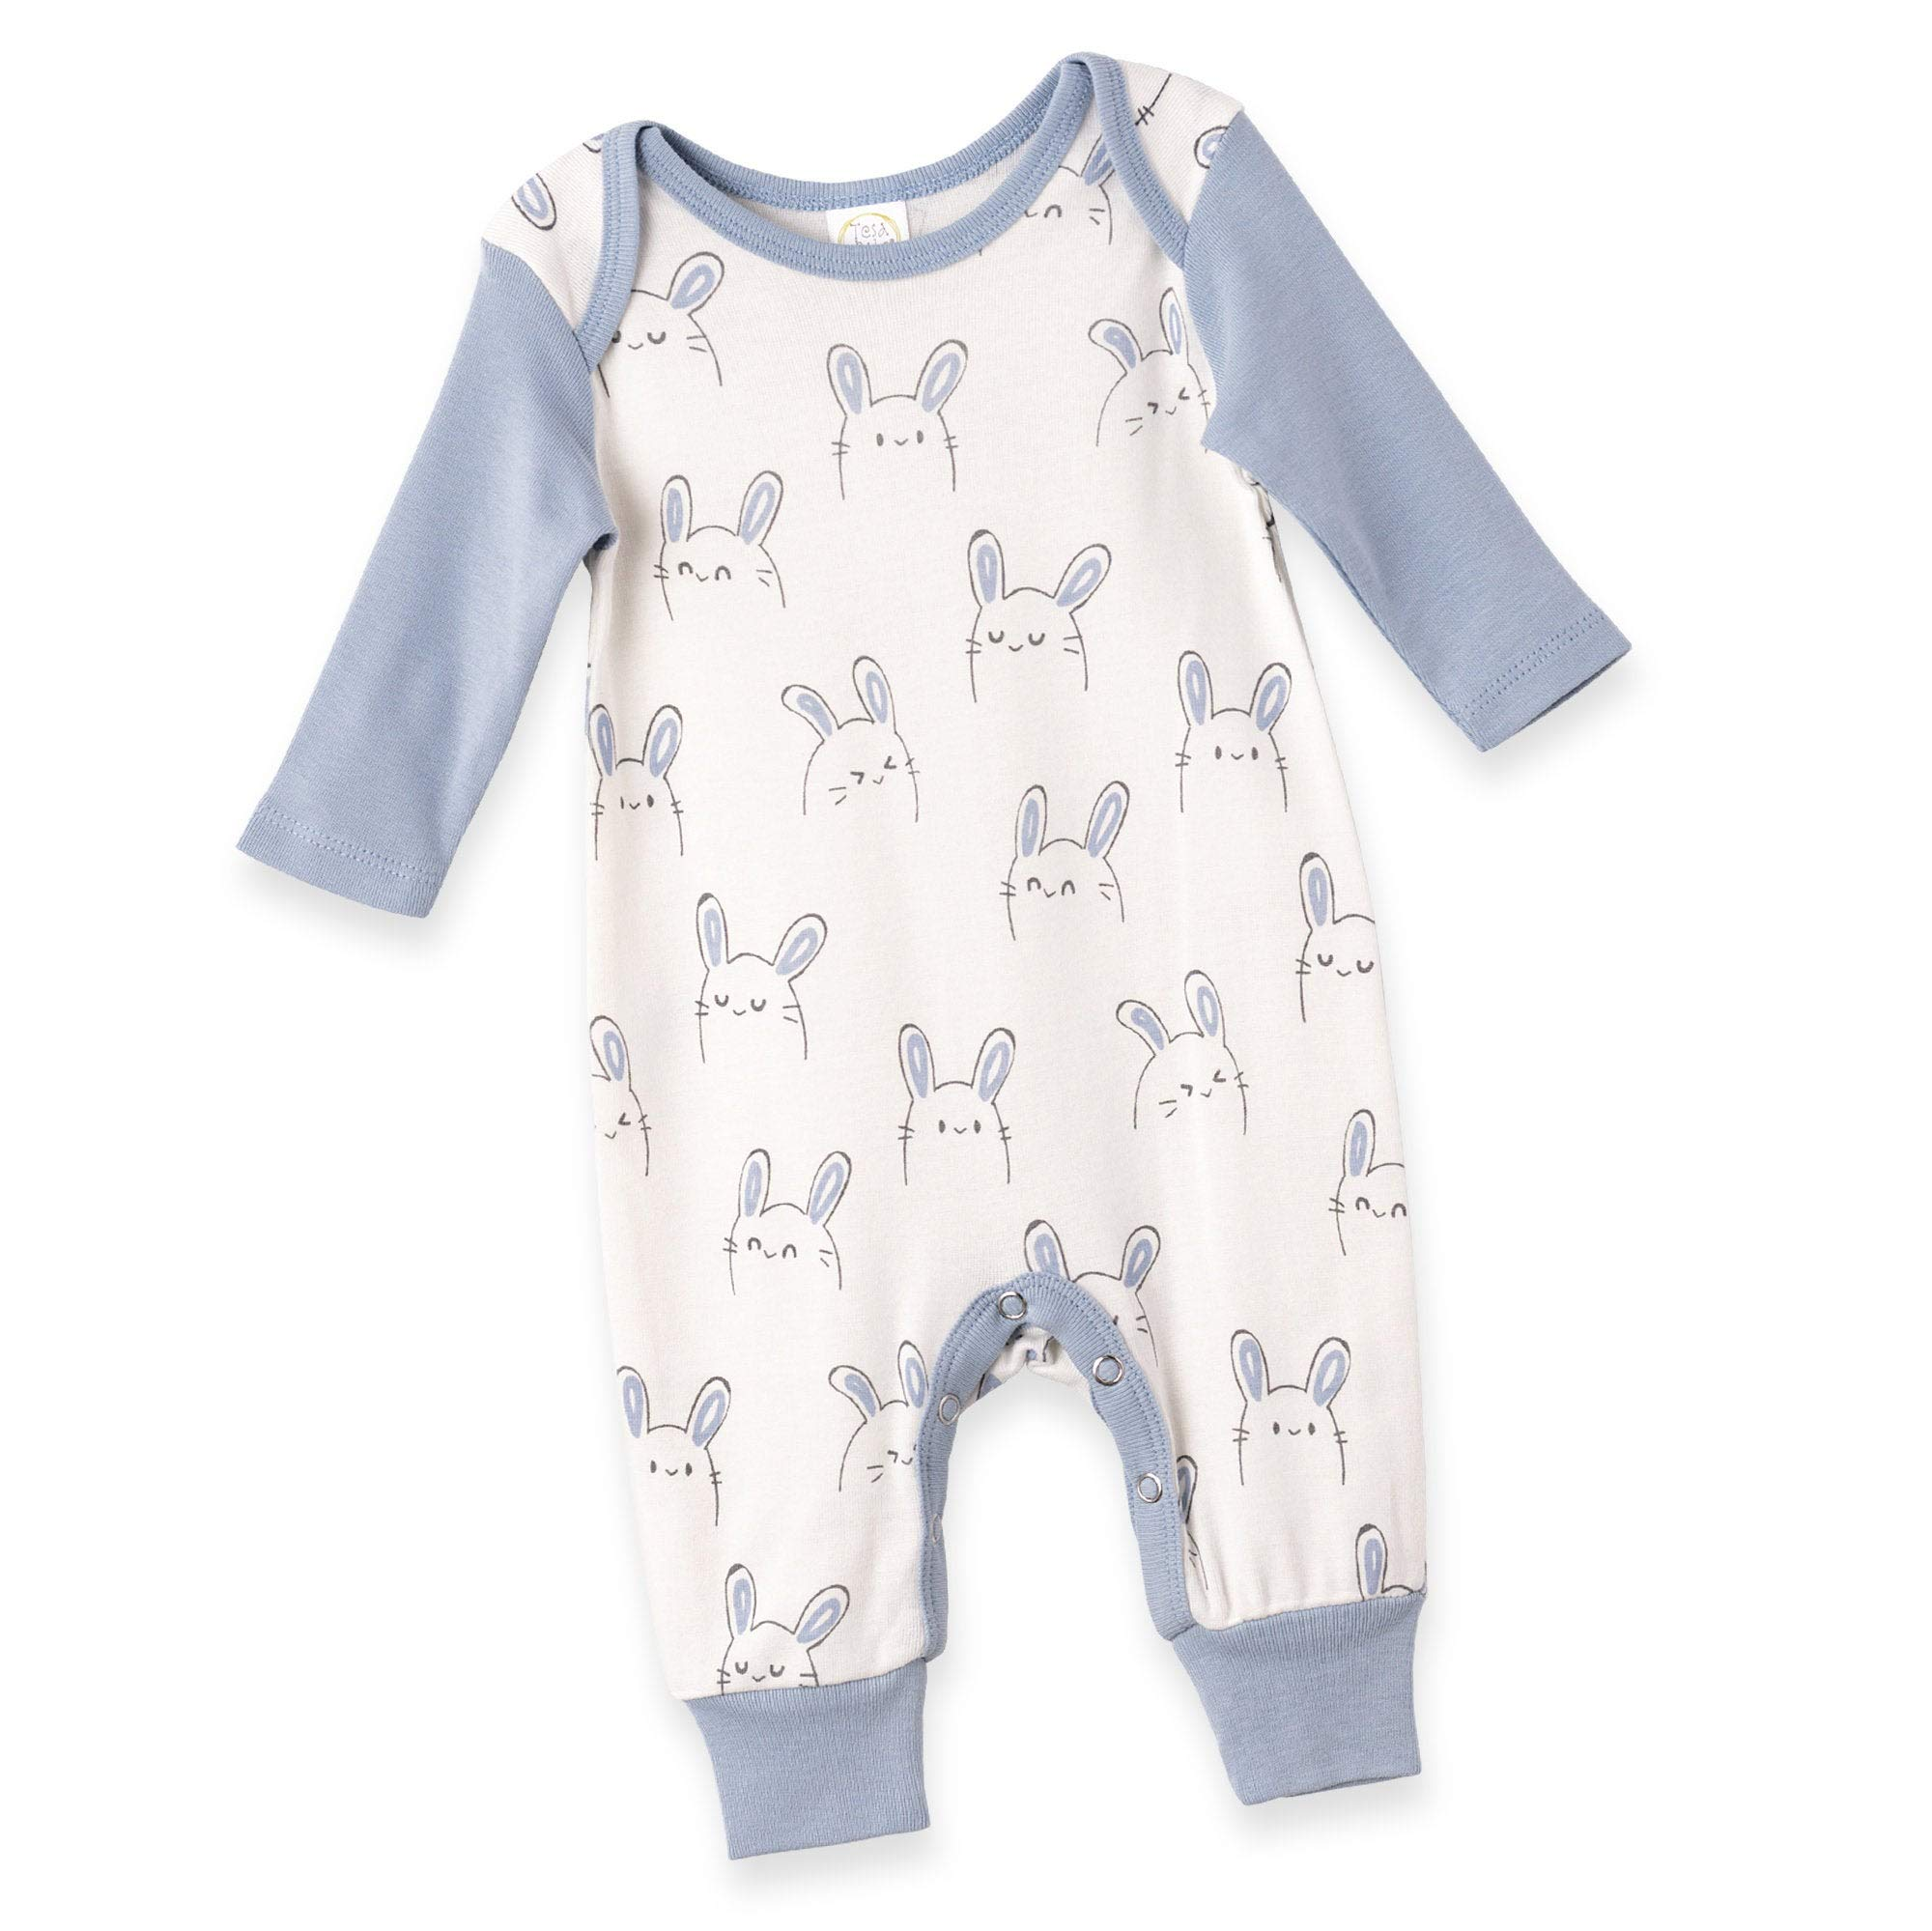 Tesa Babe Baby Easter Romper for Newborn Boy Girl Infant to Toddler in Bunny Print, Multi